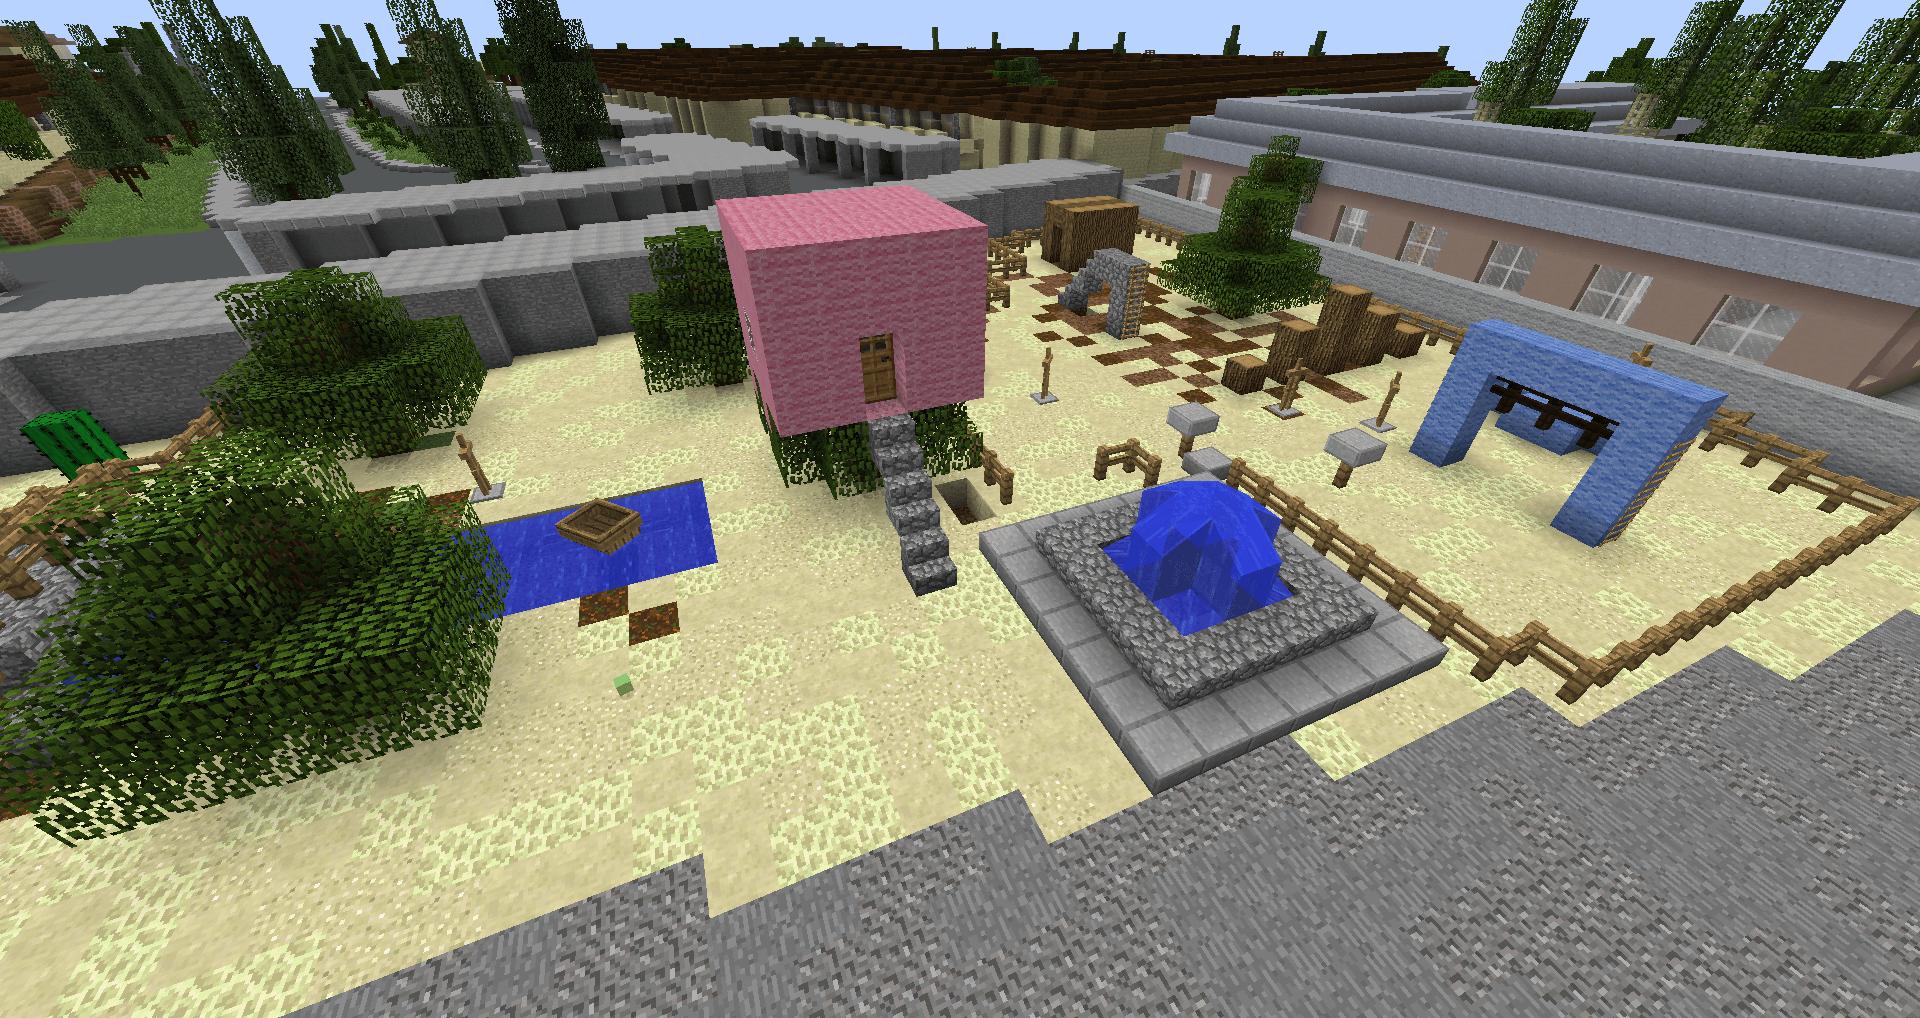 Minecraft Model of public space concept designed by migrant children, Anaheim, California